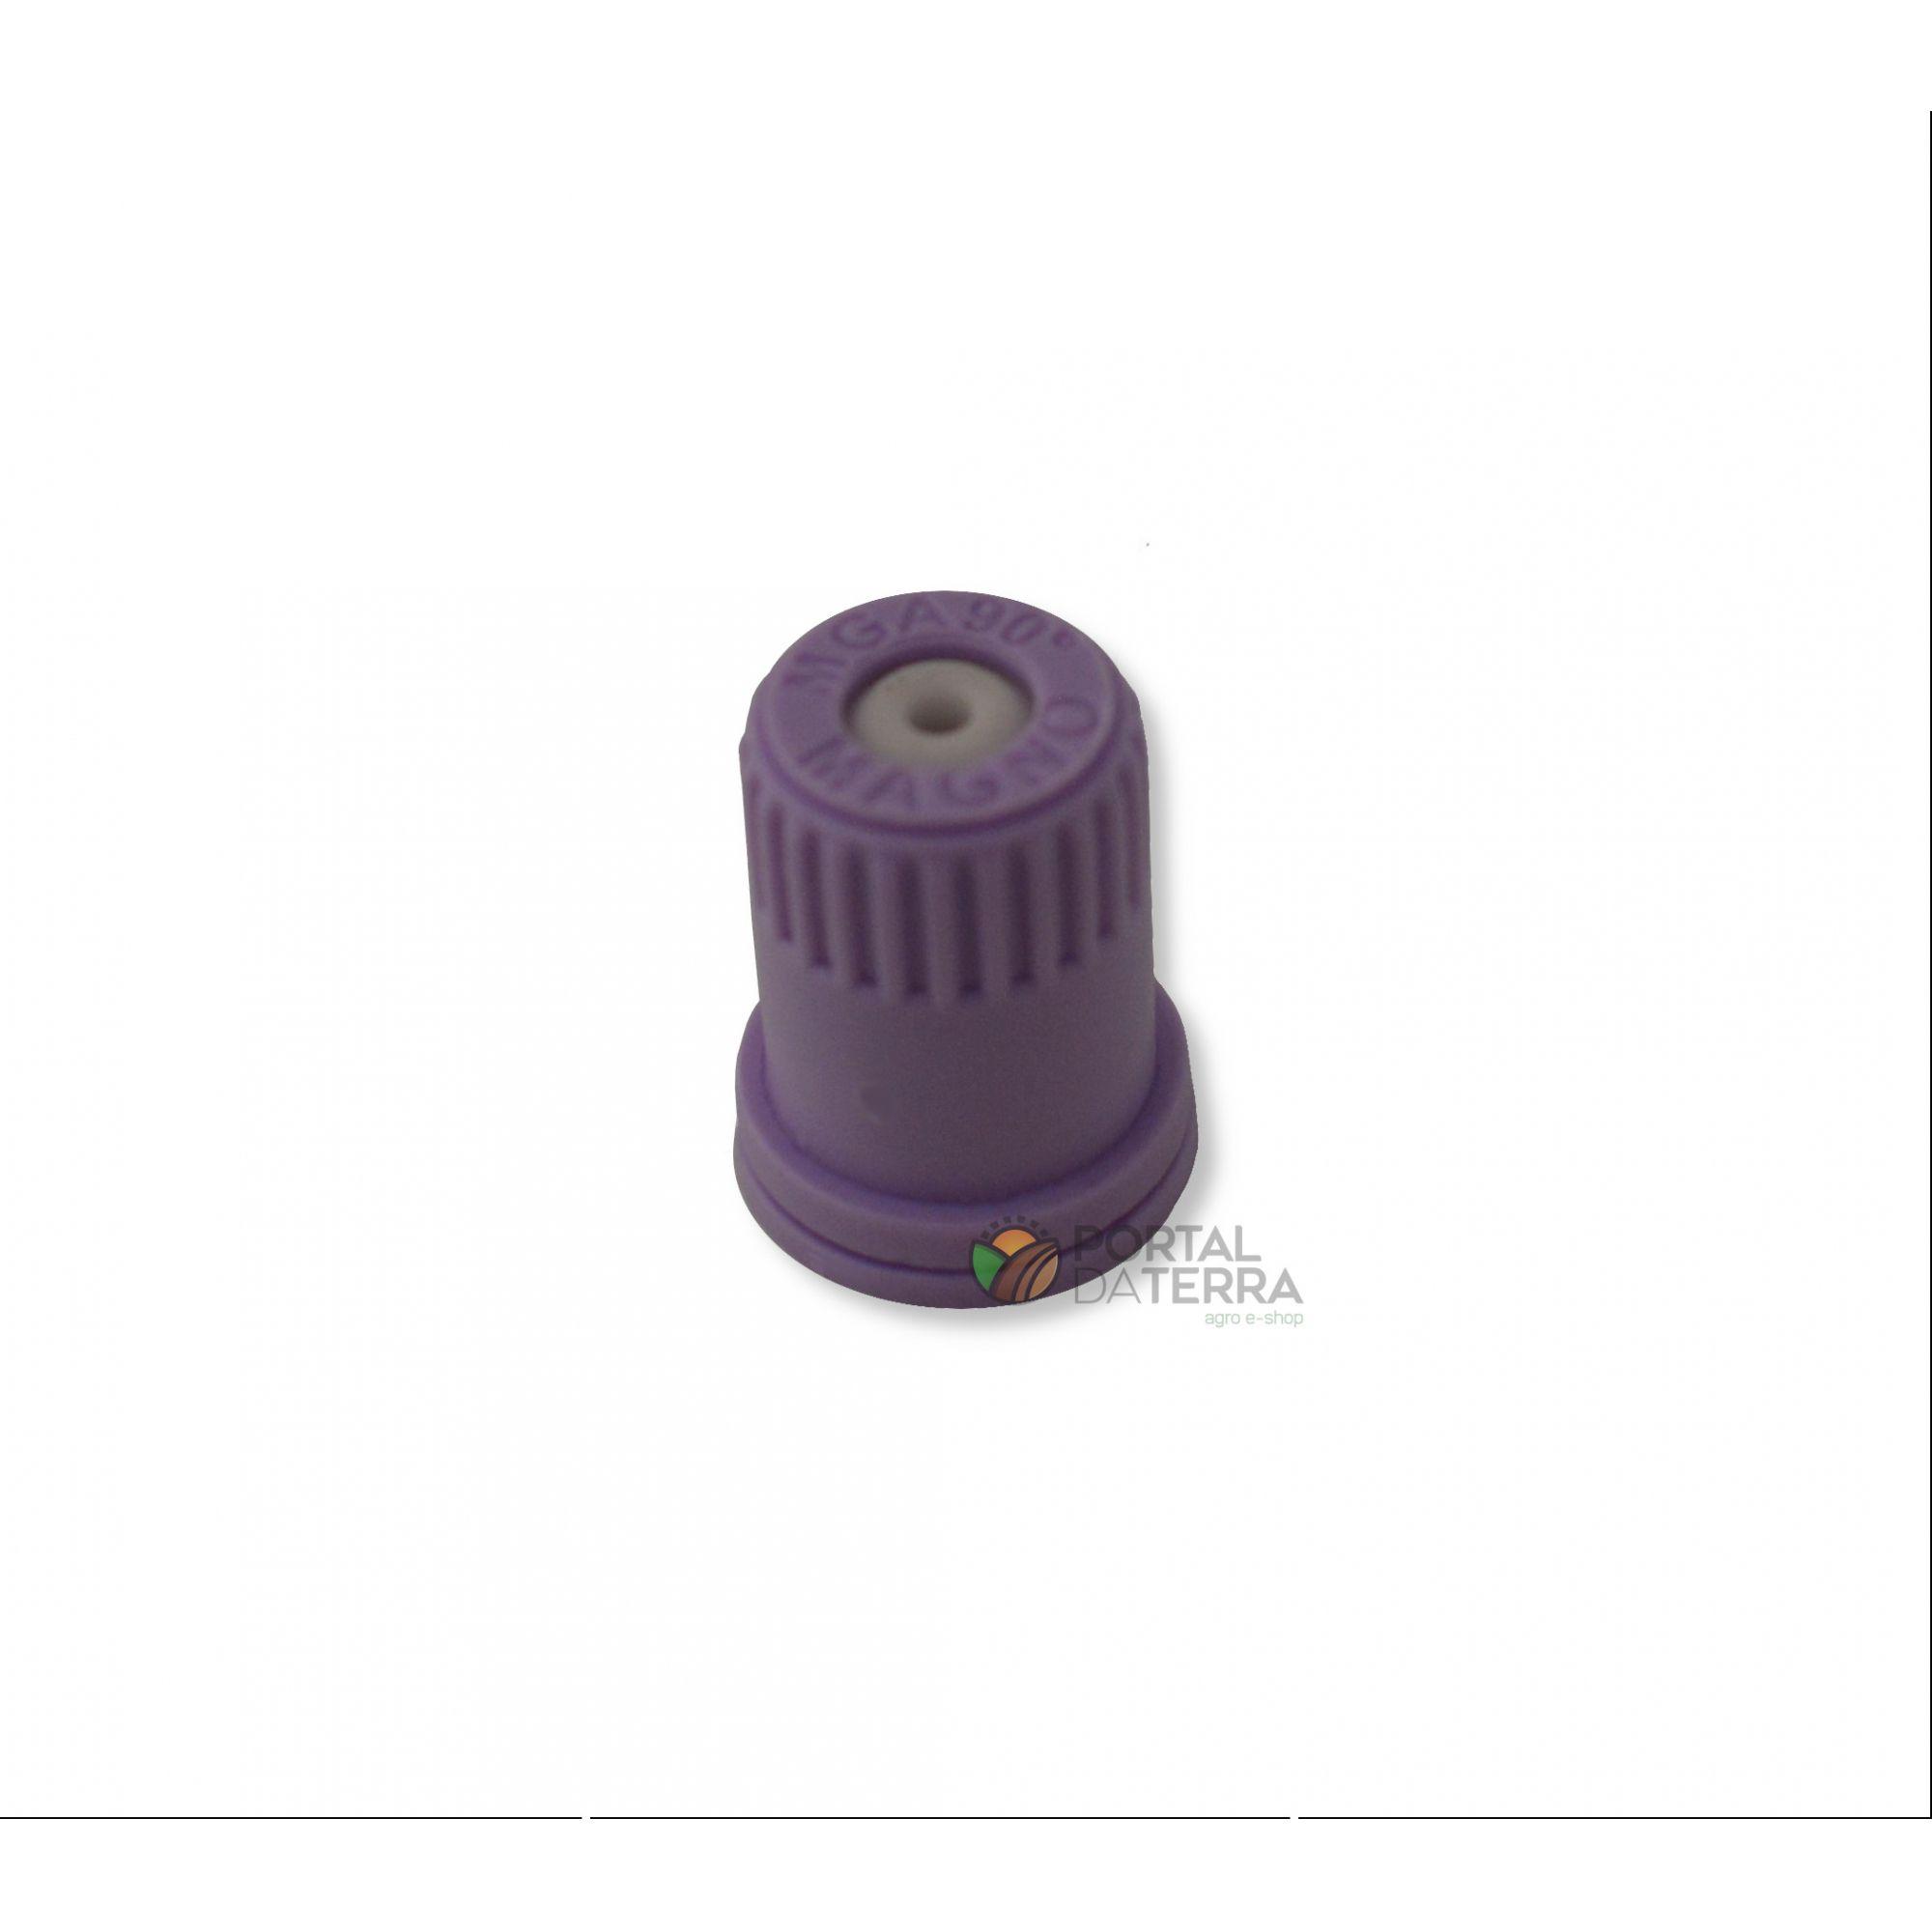 Bico Cone Gotas Atomizadas MGA 90025- Lilas